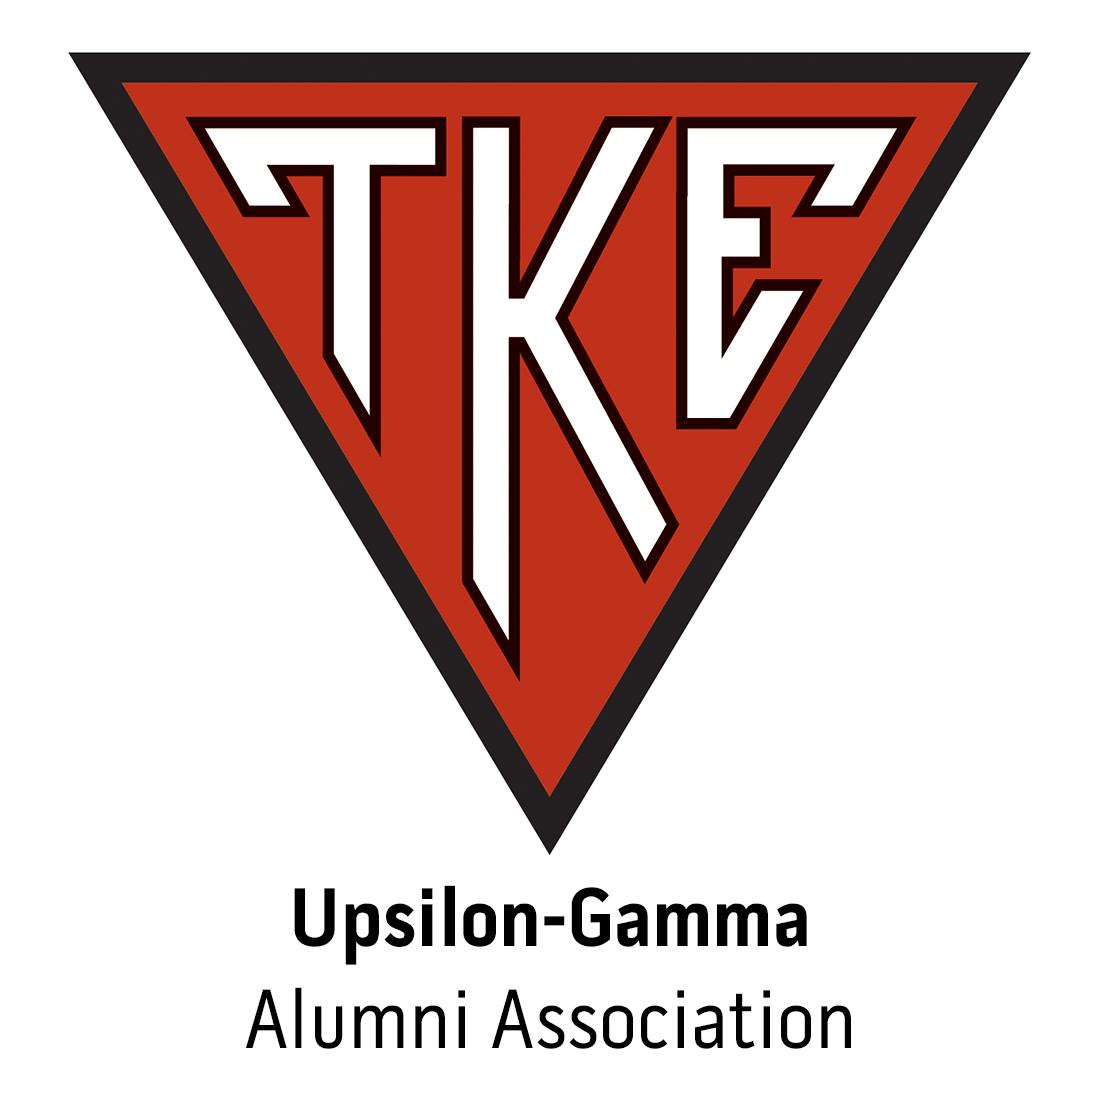 Upsilon-Gamma Alumni Association at University of Minnesota Duluth